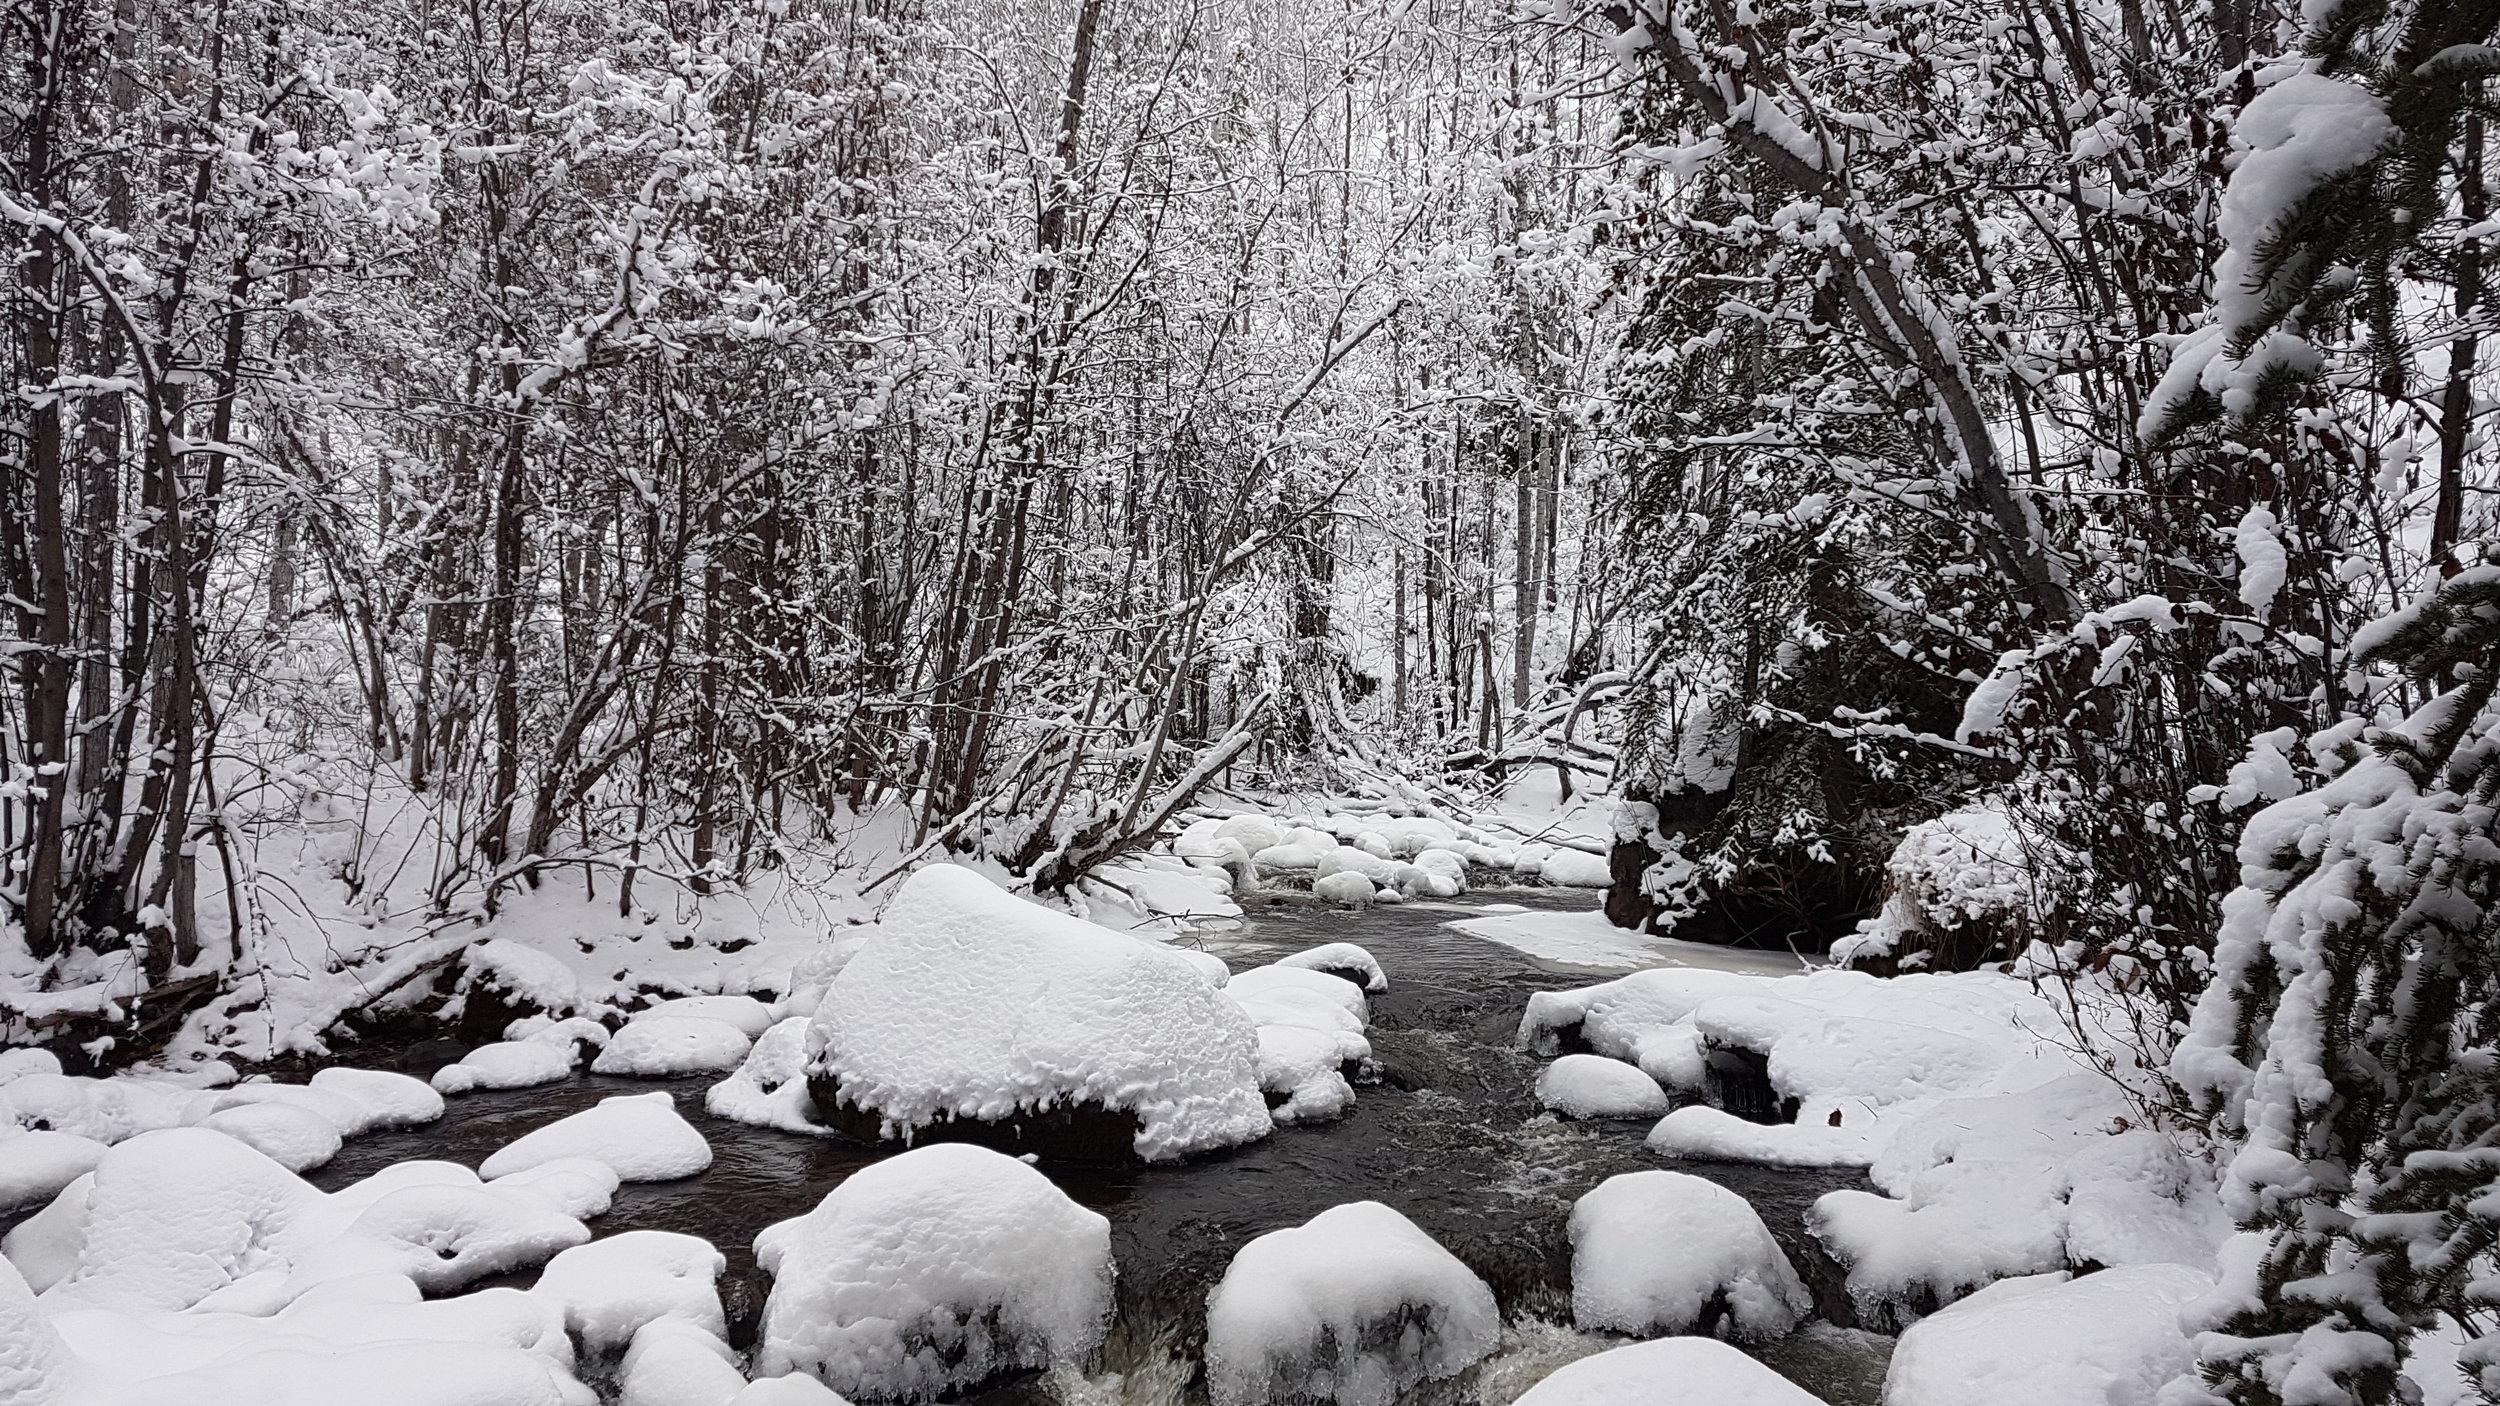 A snowy winter paradise